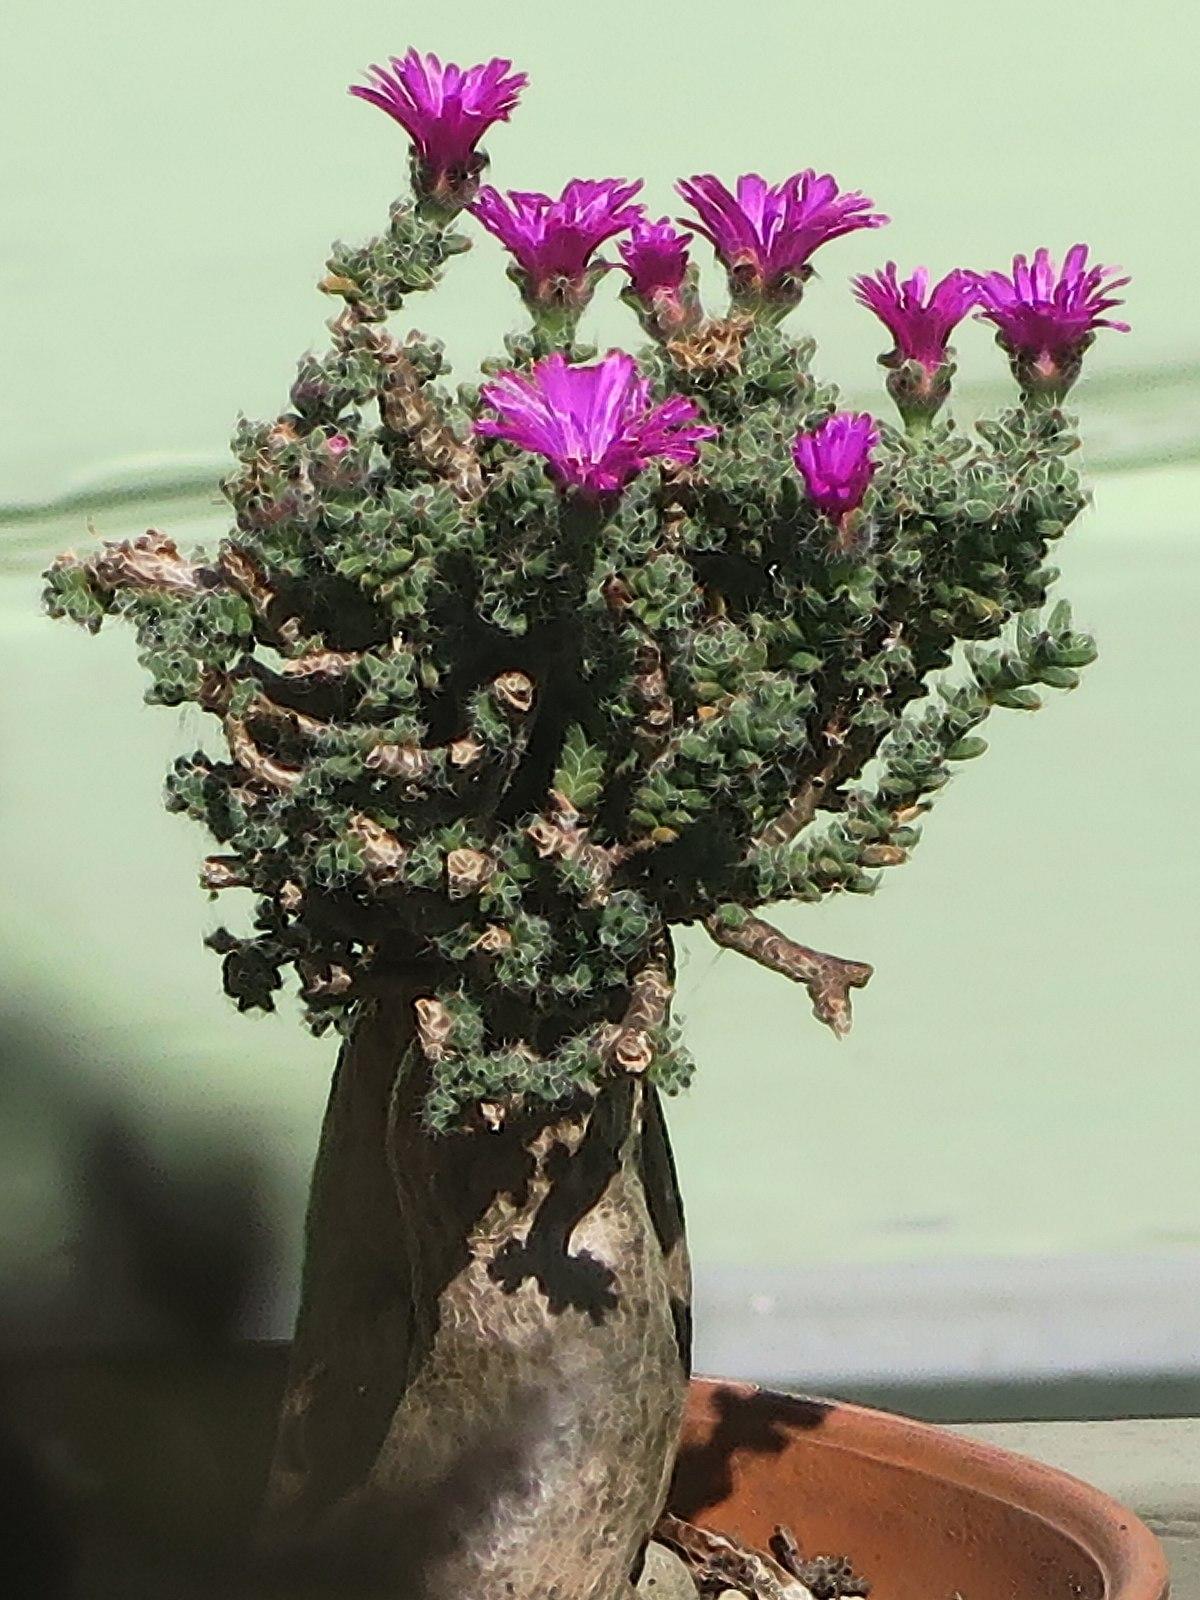 Trichodiadema Bulbosum Wikipedia